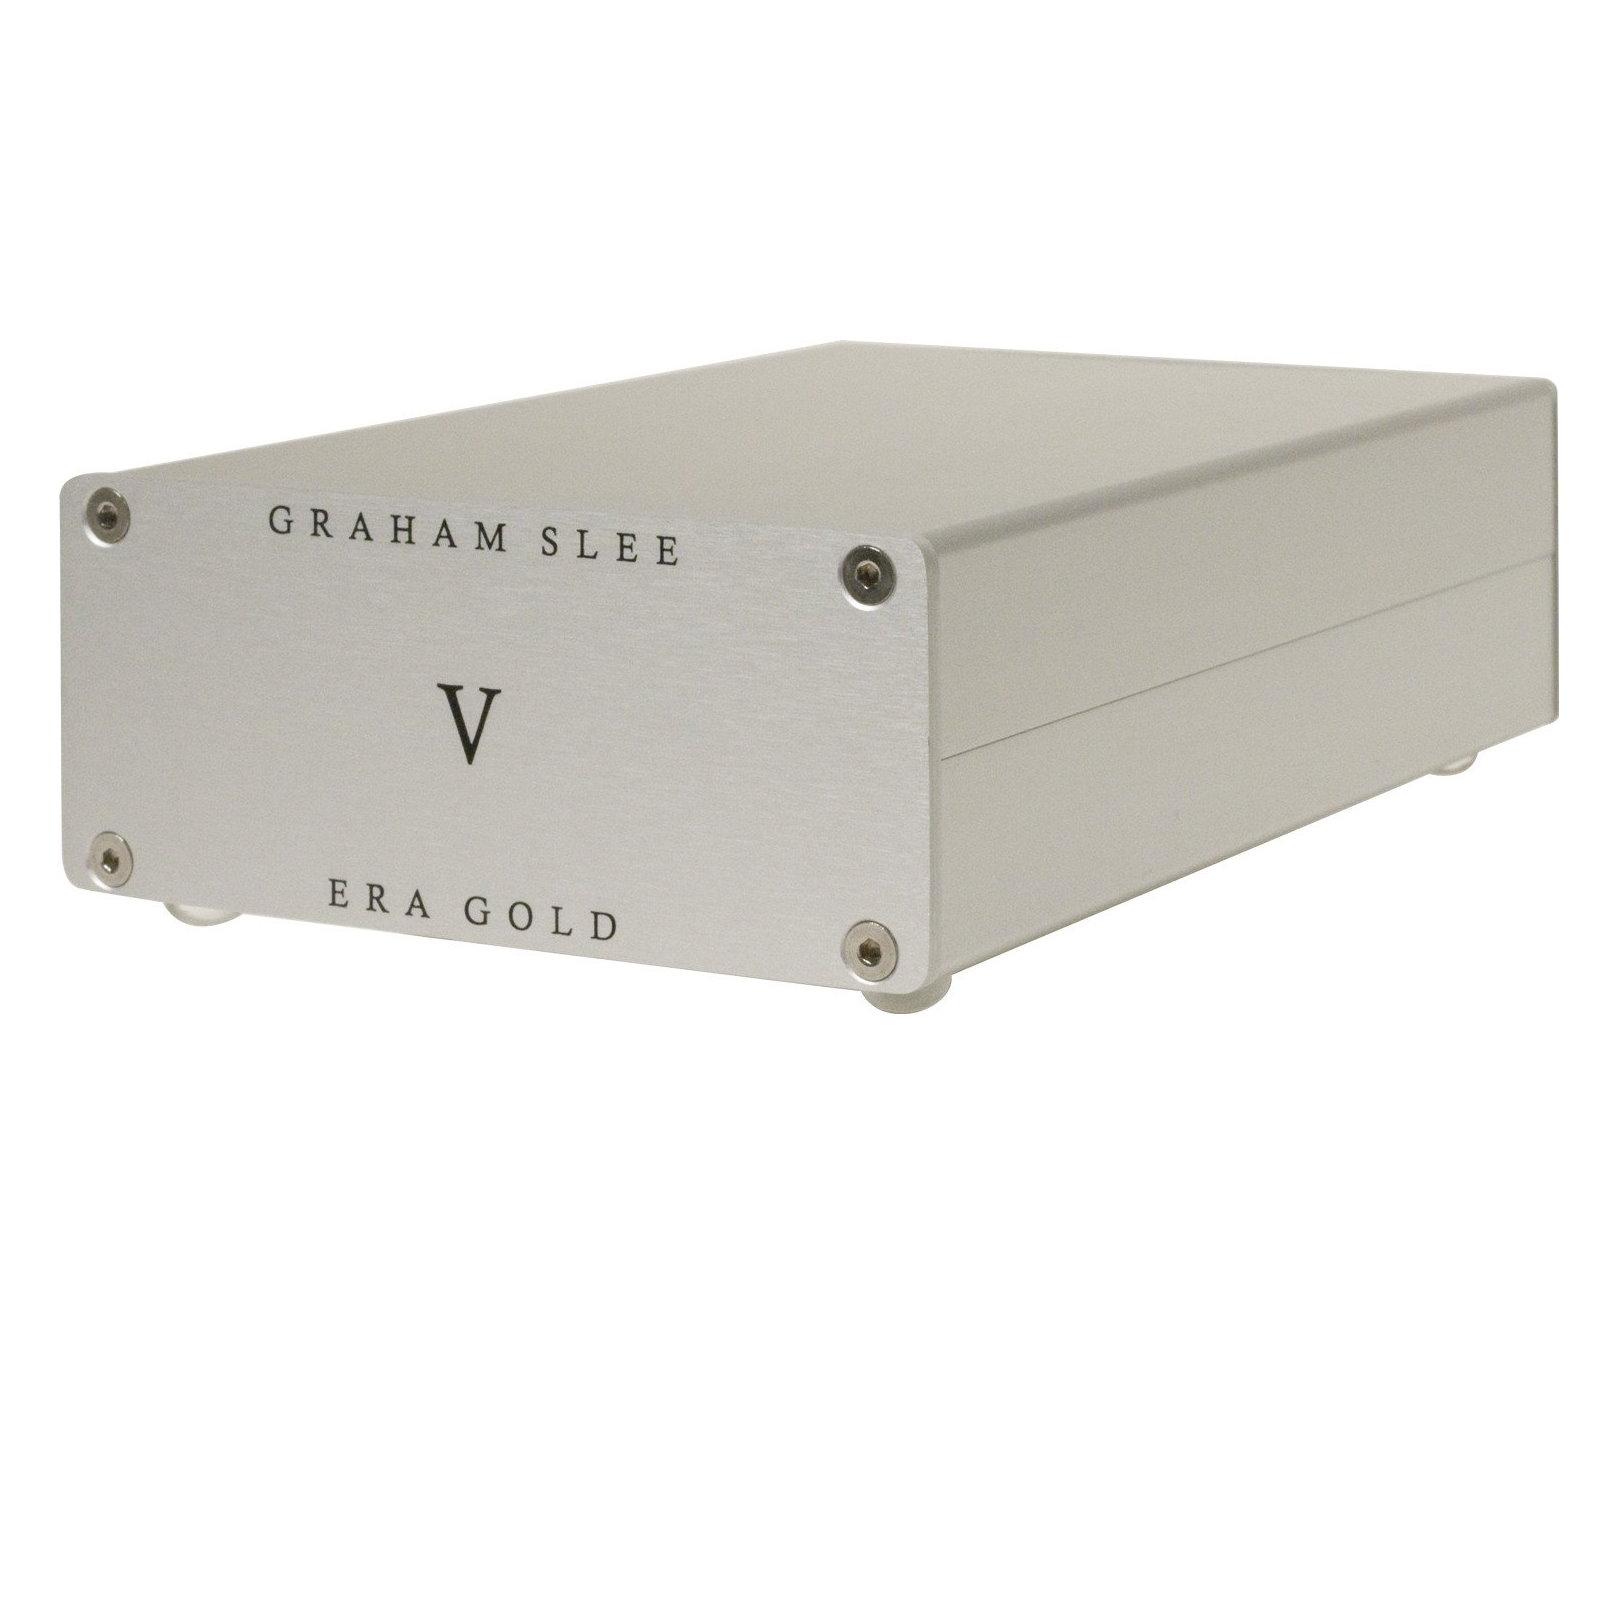 Graham Slee ERA Gold MK V Phono Preamplifier with PSU1 Power Supply